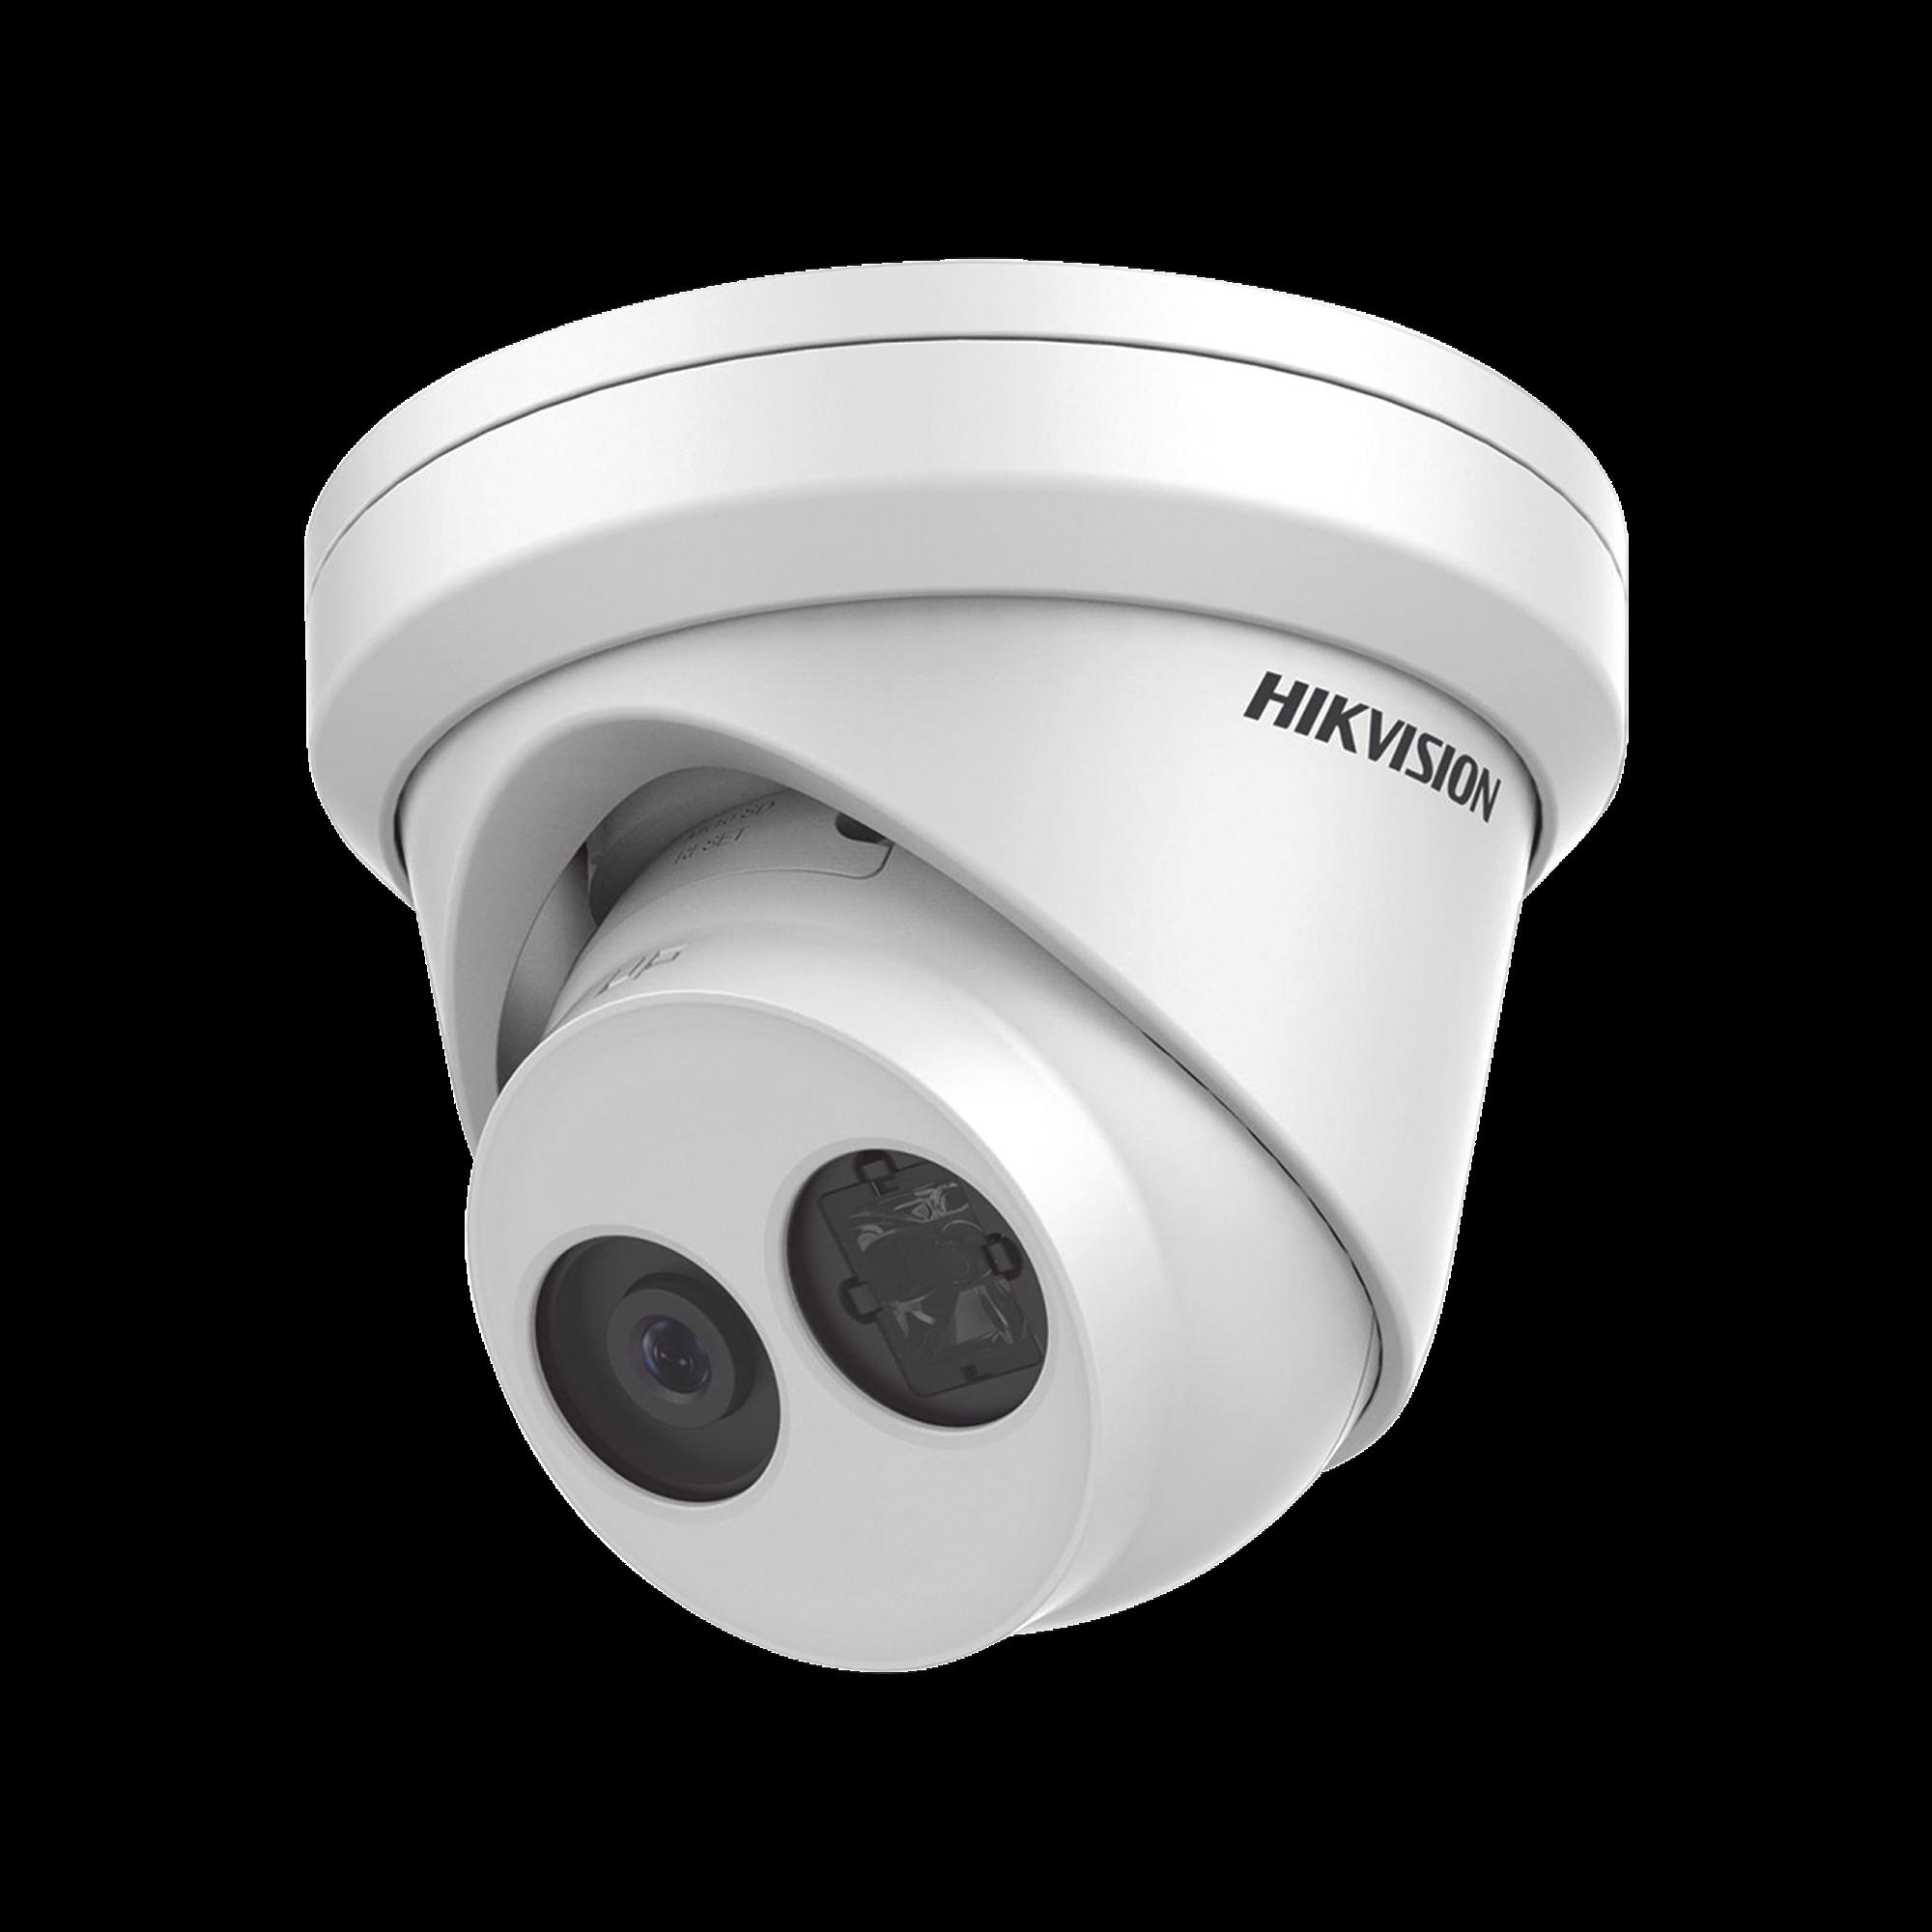 Turret IP 8 Megapixel (4K) / 30 mts IR EXIR / Exterior IP67 / WDR 120 dB / PoE / Lente 2.8 mm / Videoanaliticos Integrados